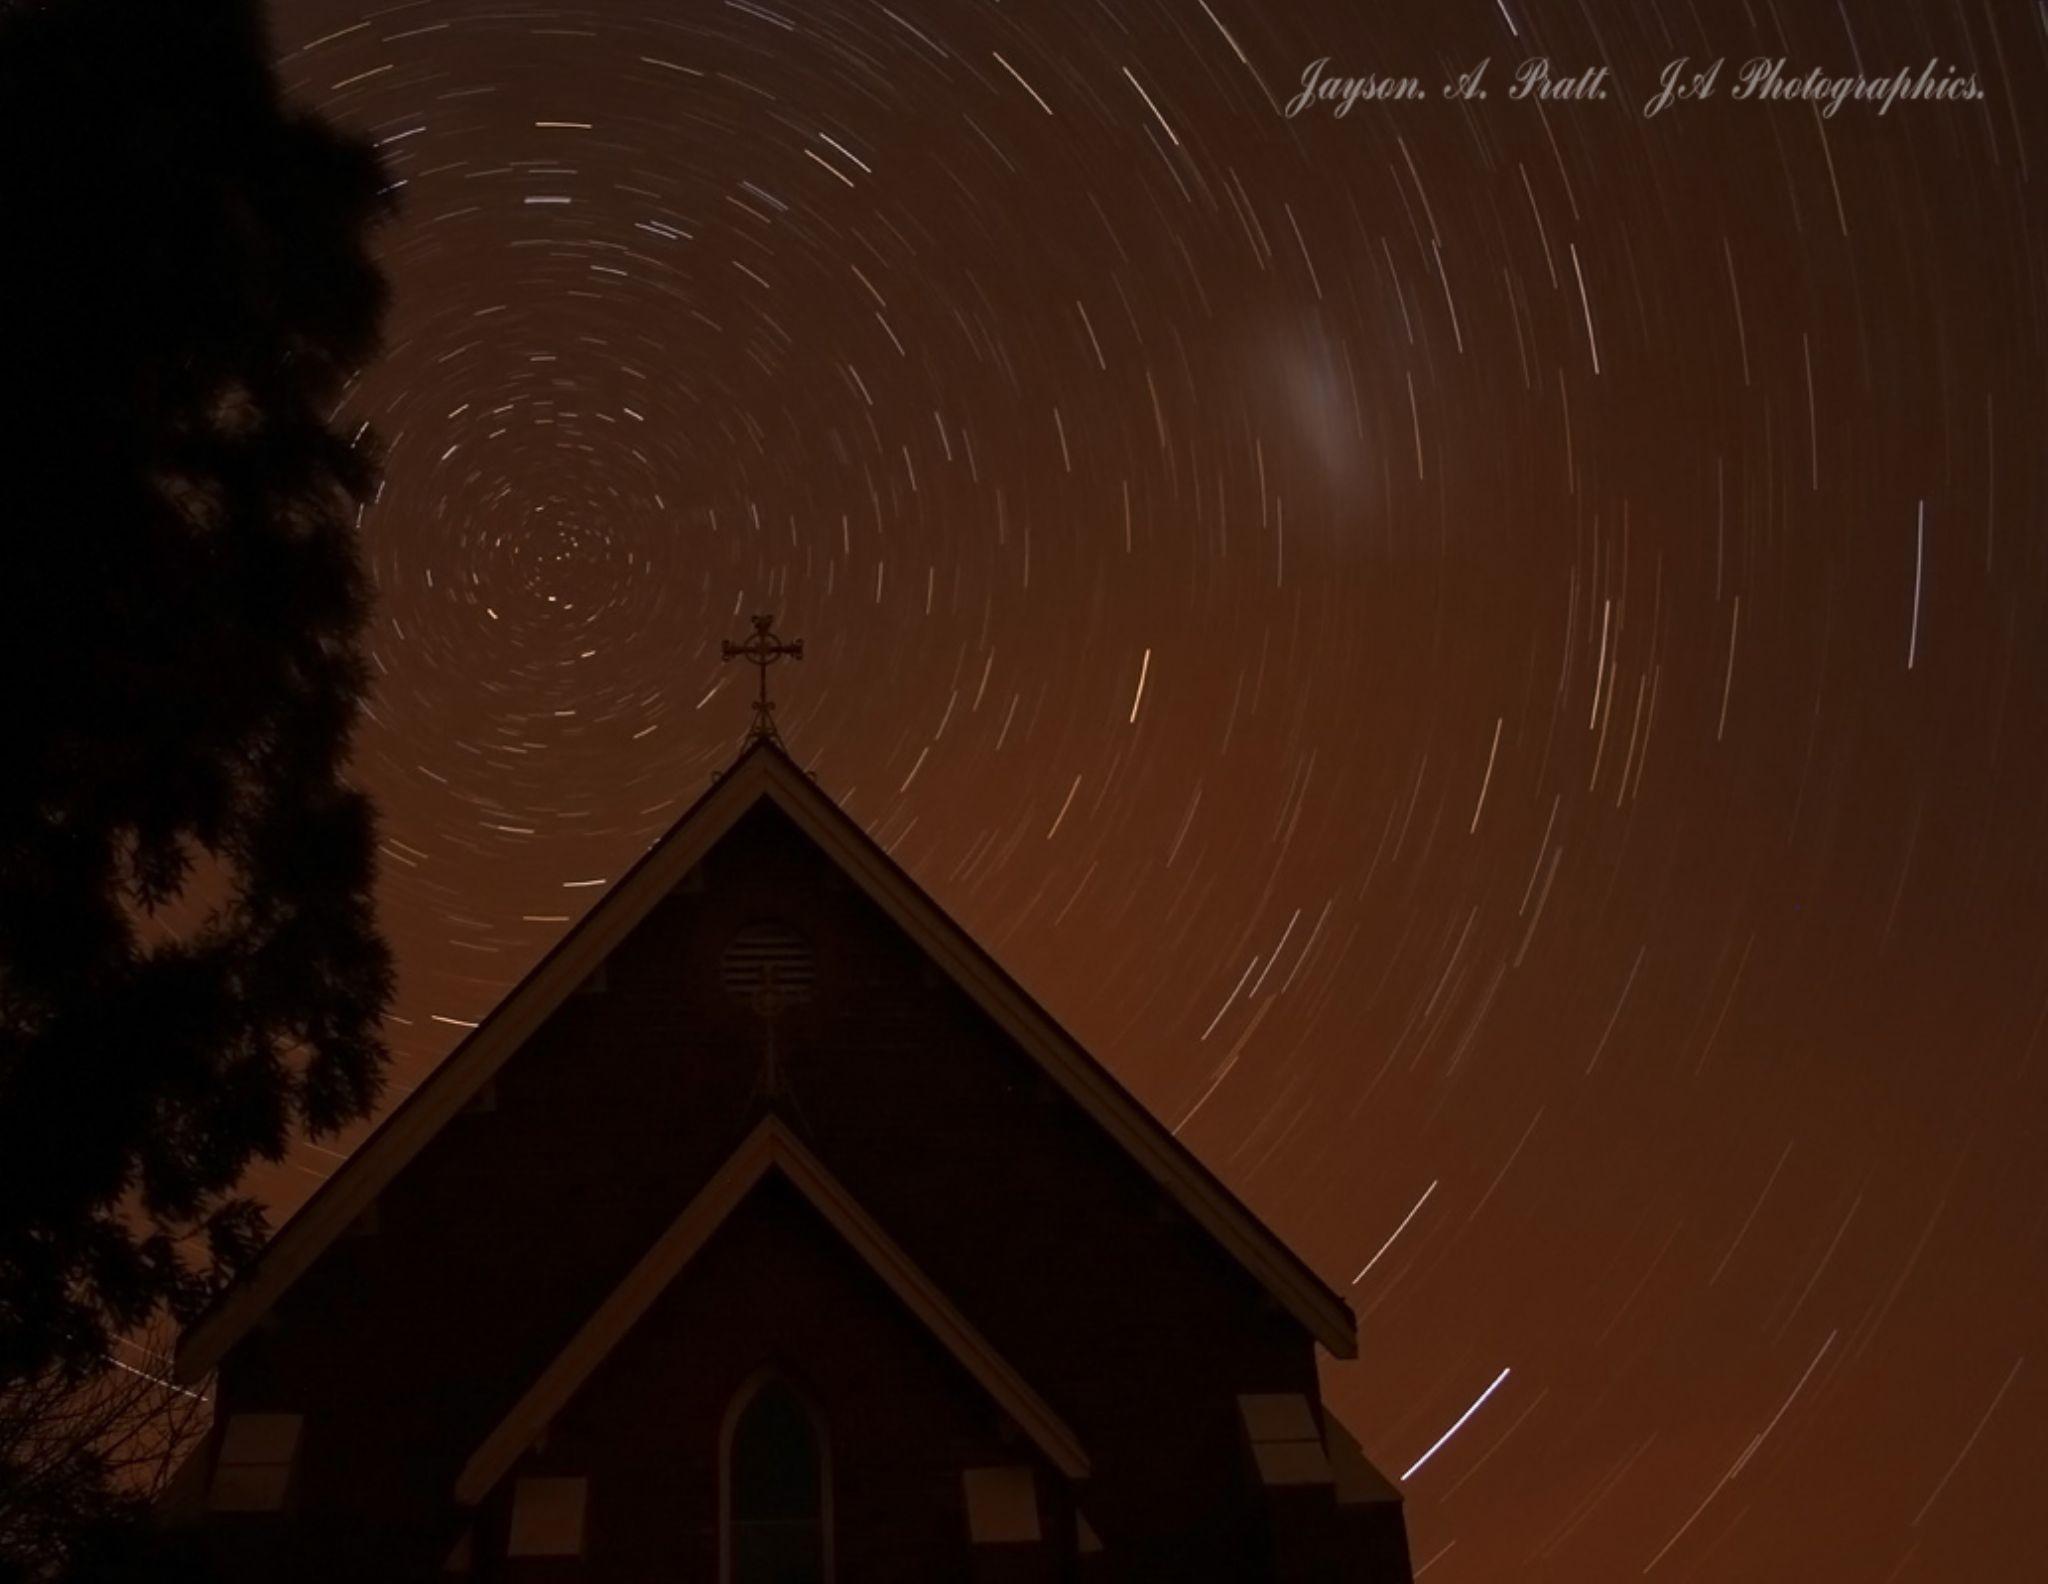 Tarrawingee church by Jayson Pratt